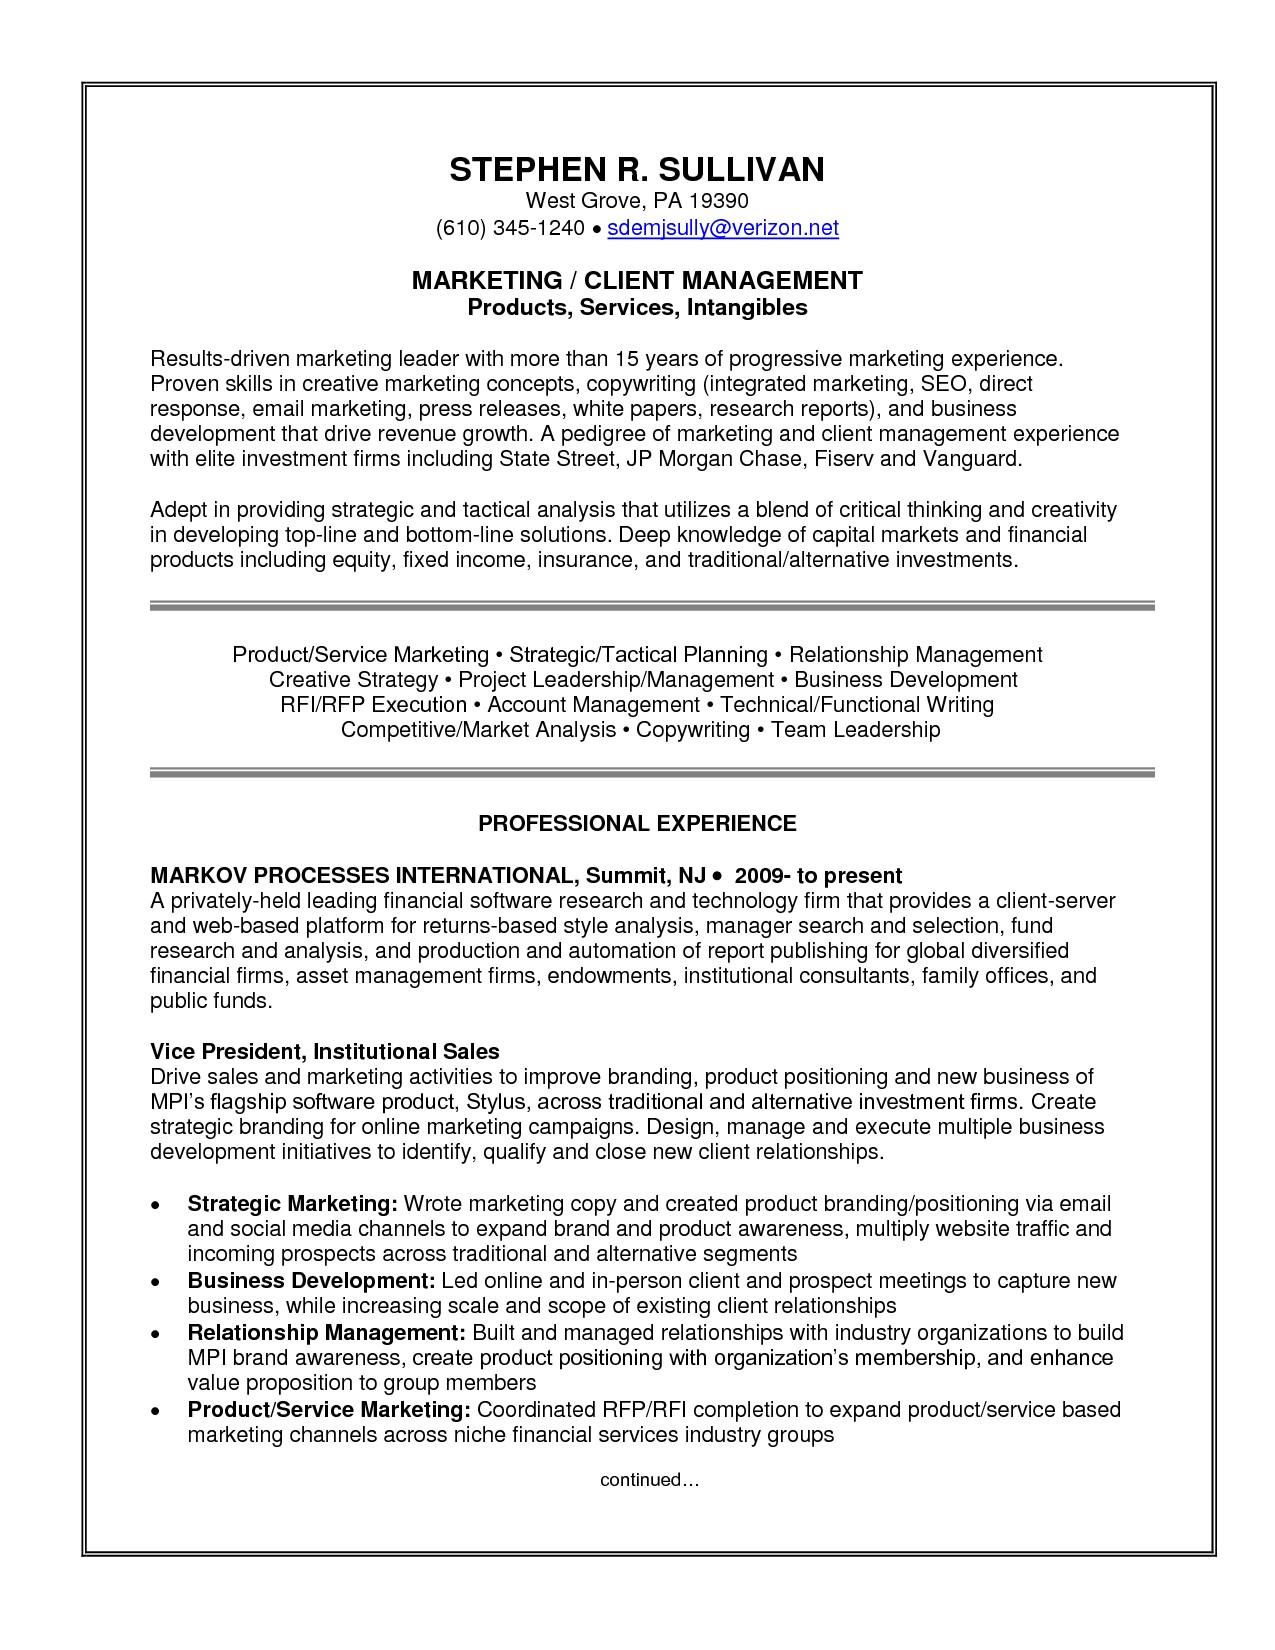 Insurance Demand Letter Template - Beautiful Insurance Demand Letter Template